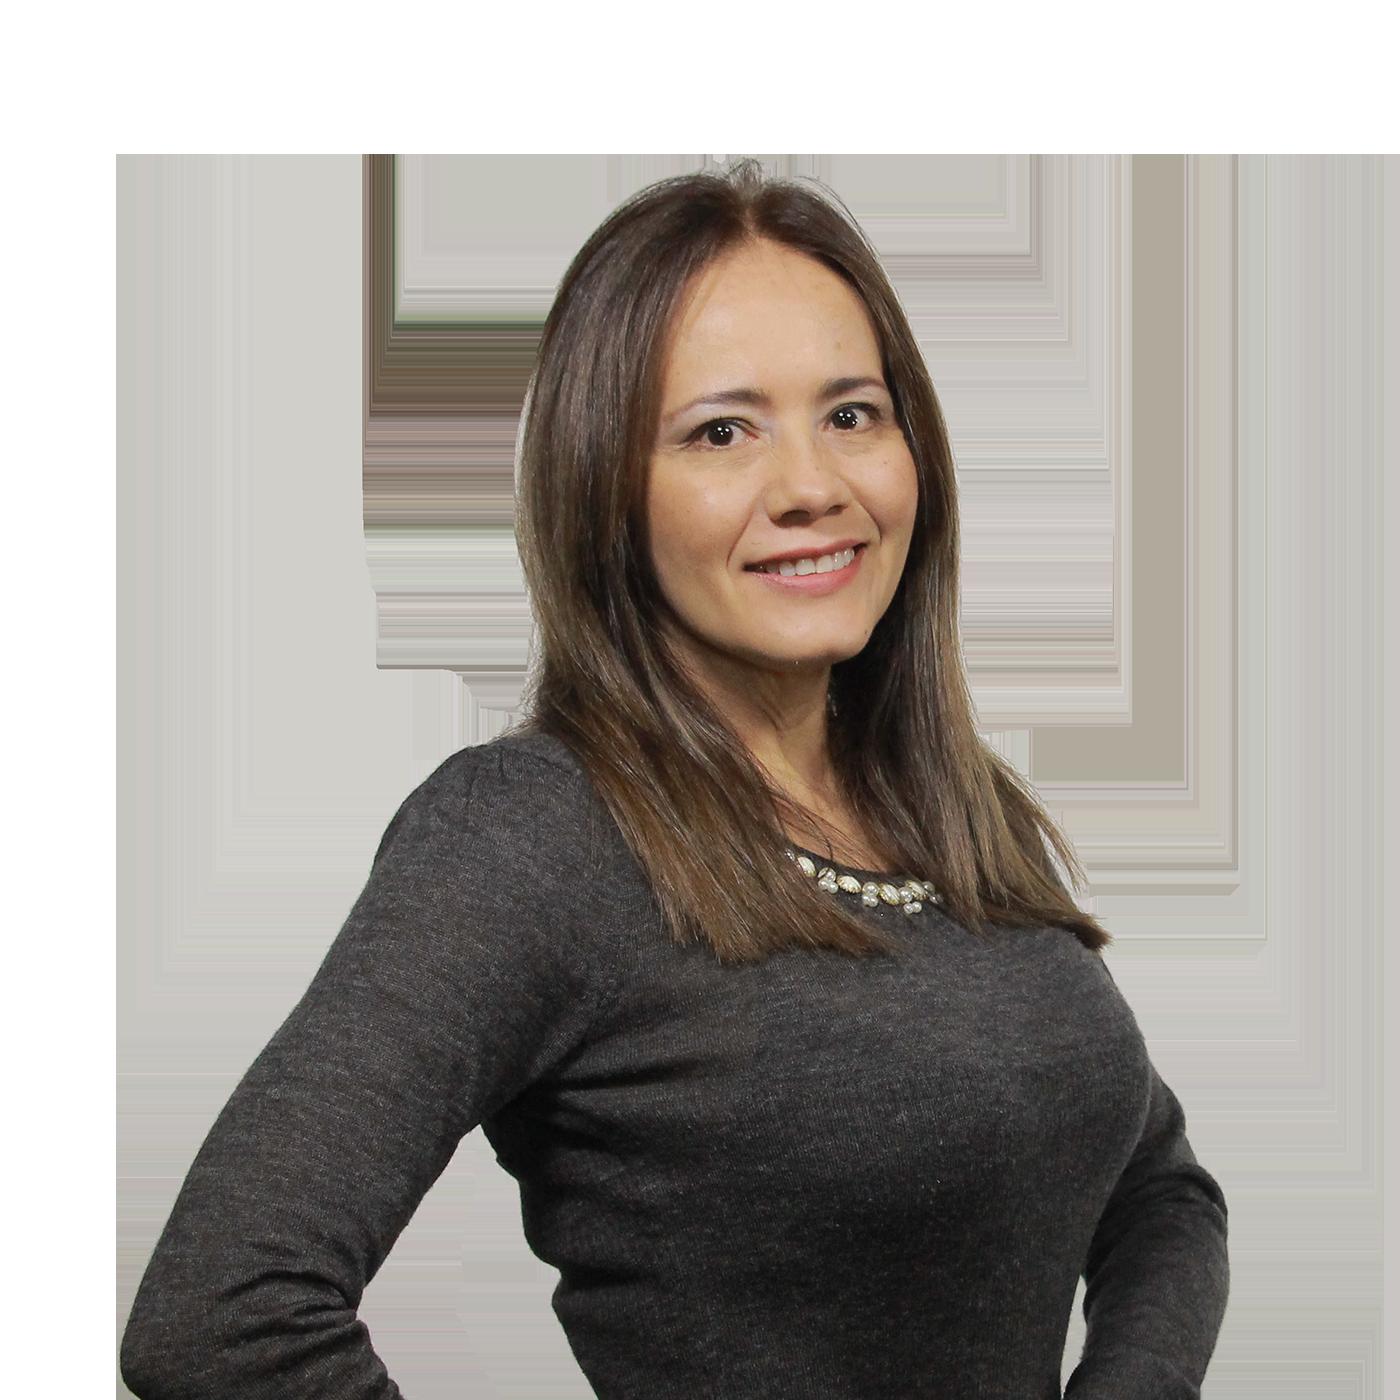 Aleyda Salcedo